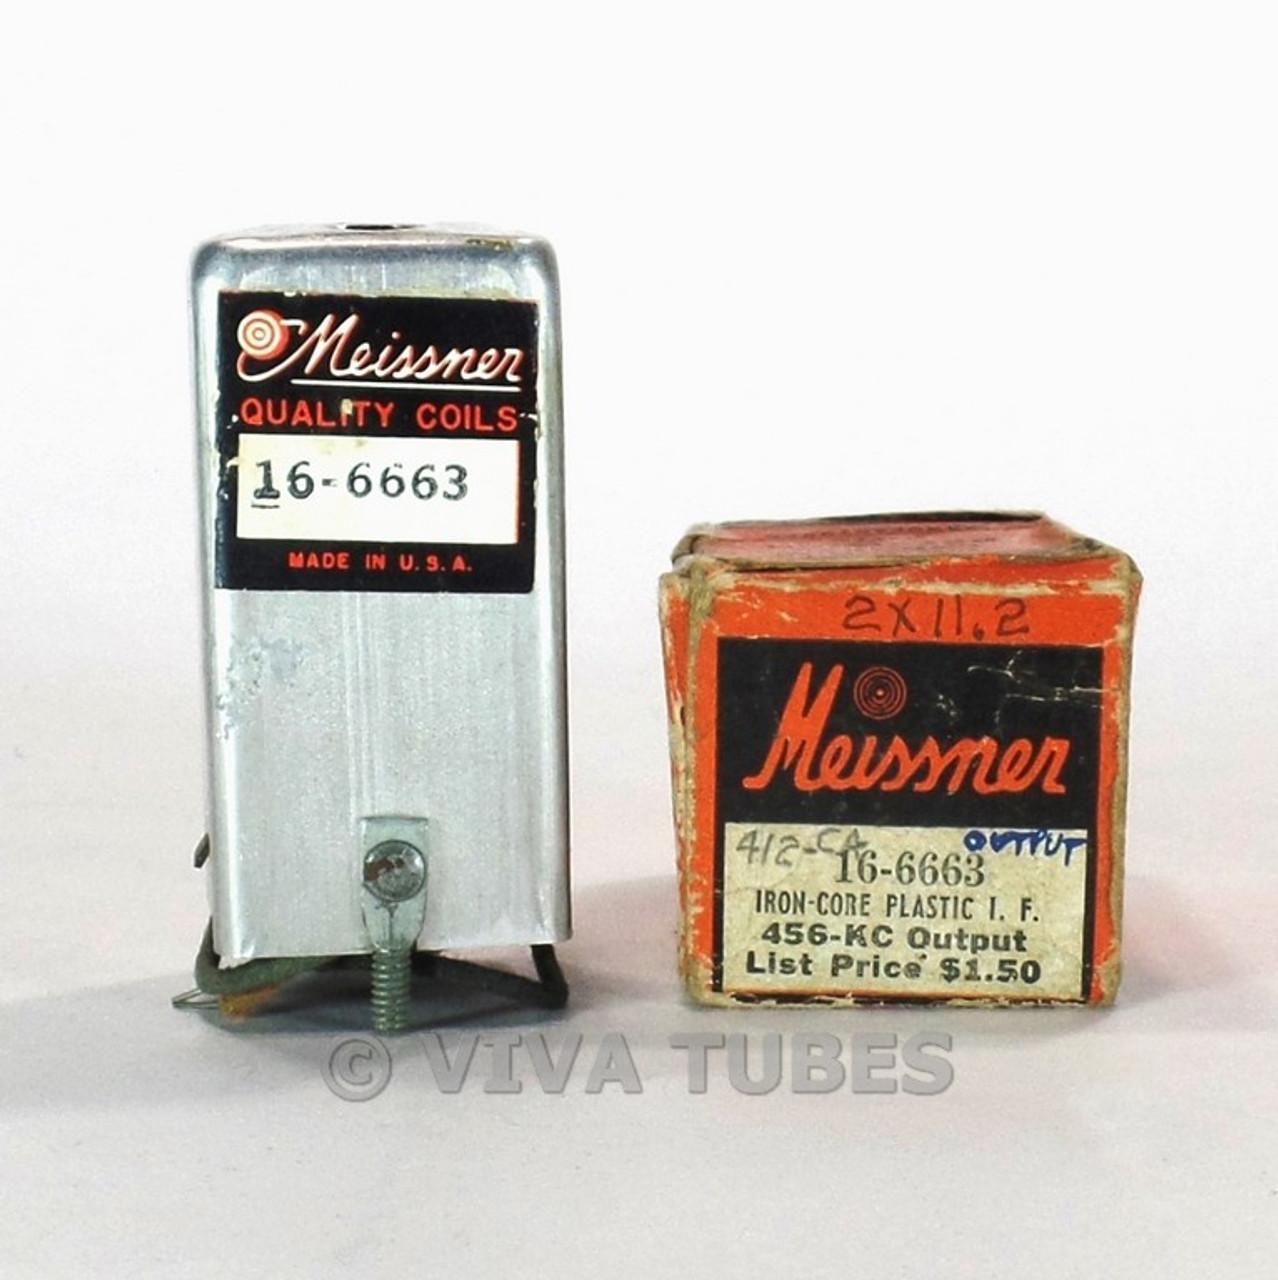 NOS NIB Vintage Meissner 16-6663 Iron-Core Plastic Radio Output IF  Transformer